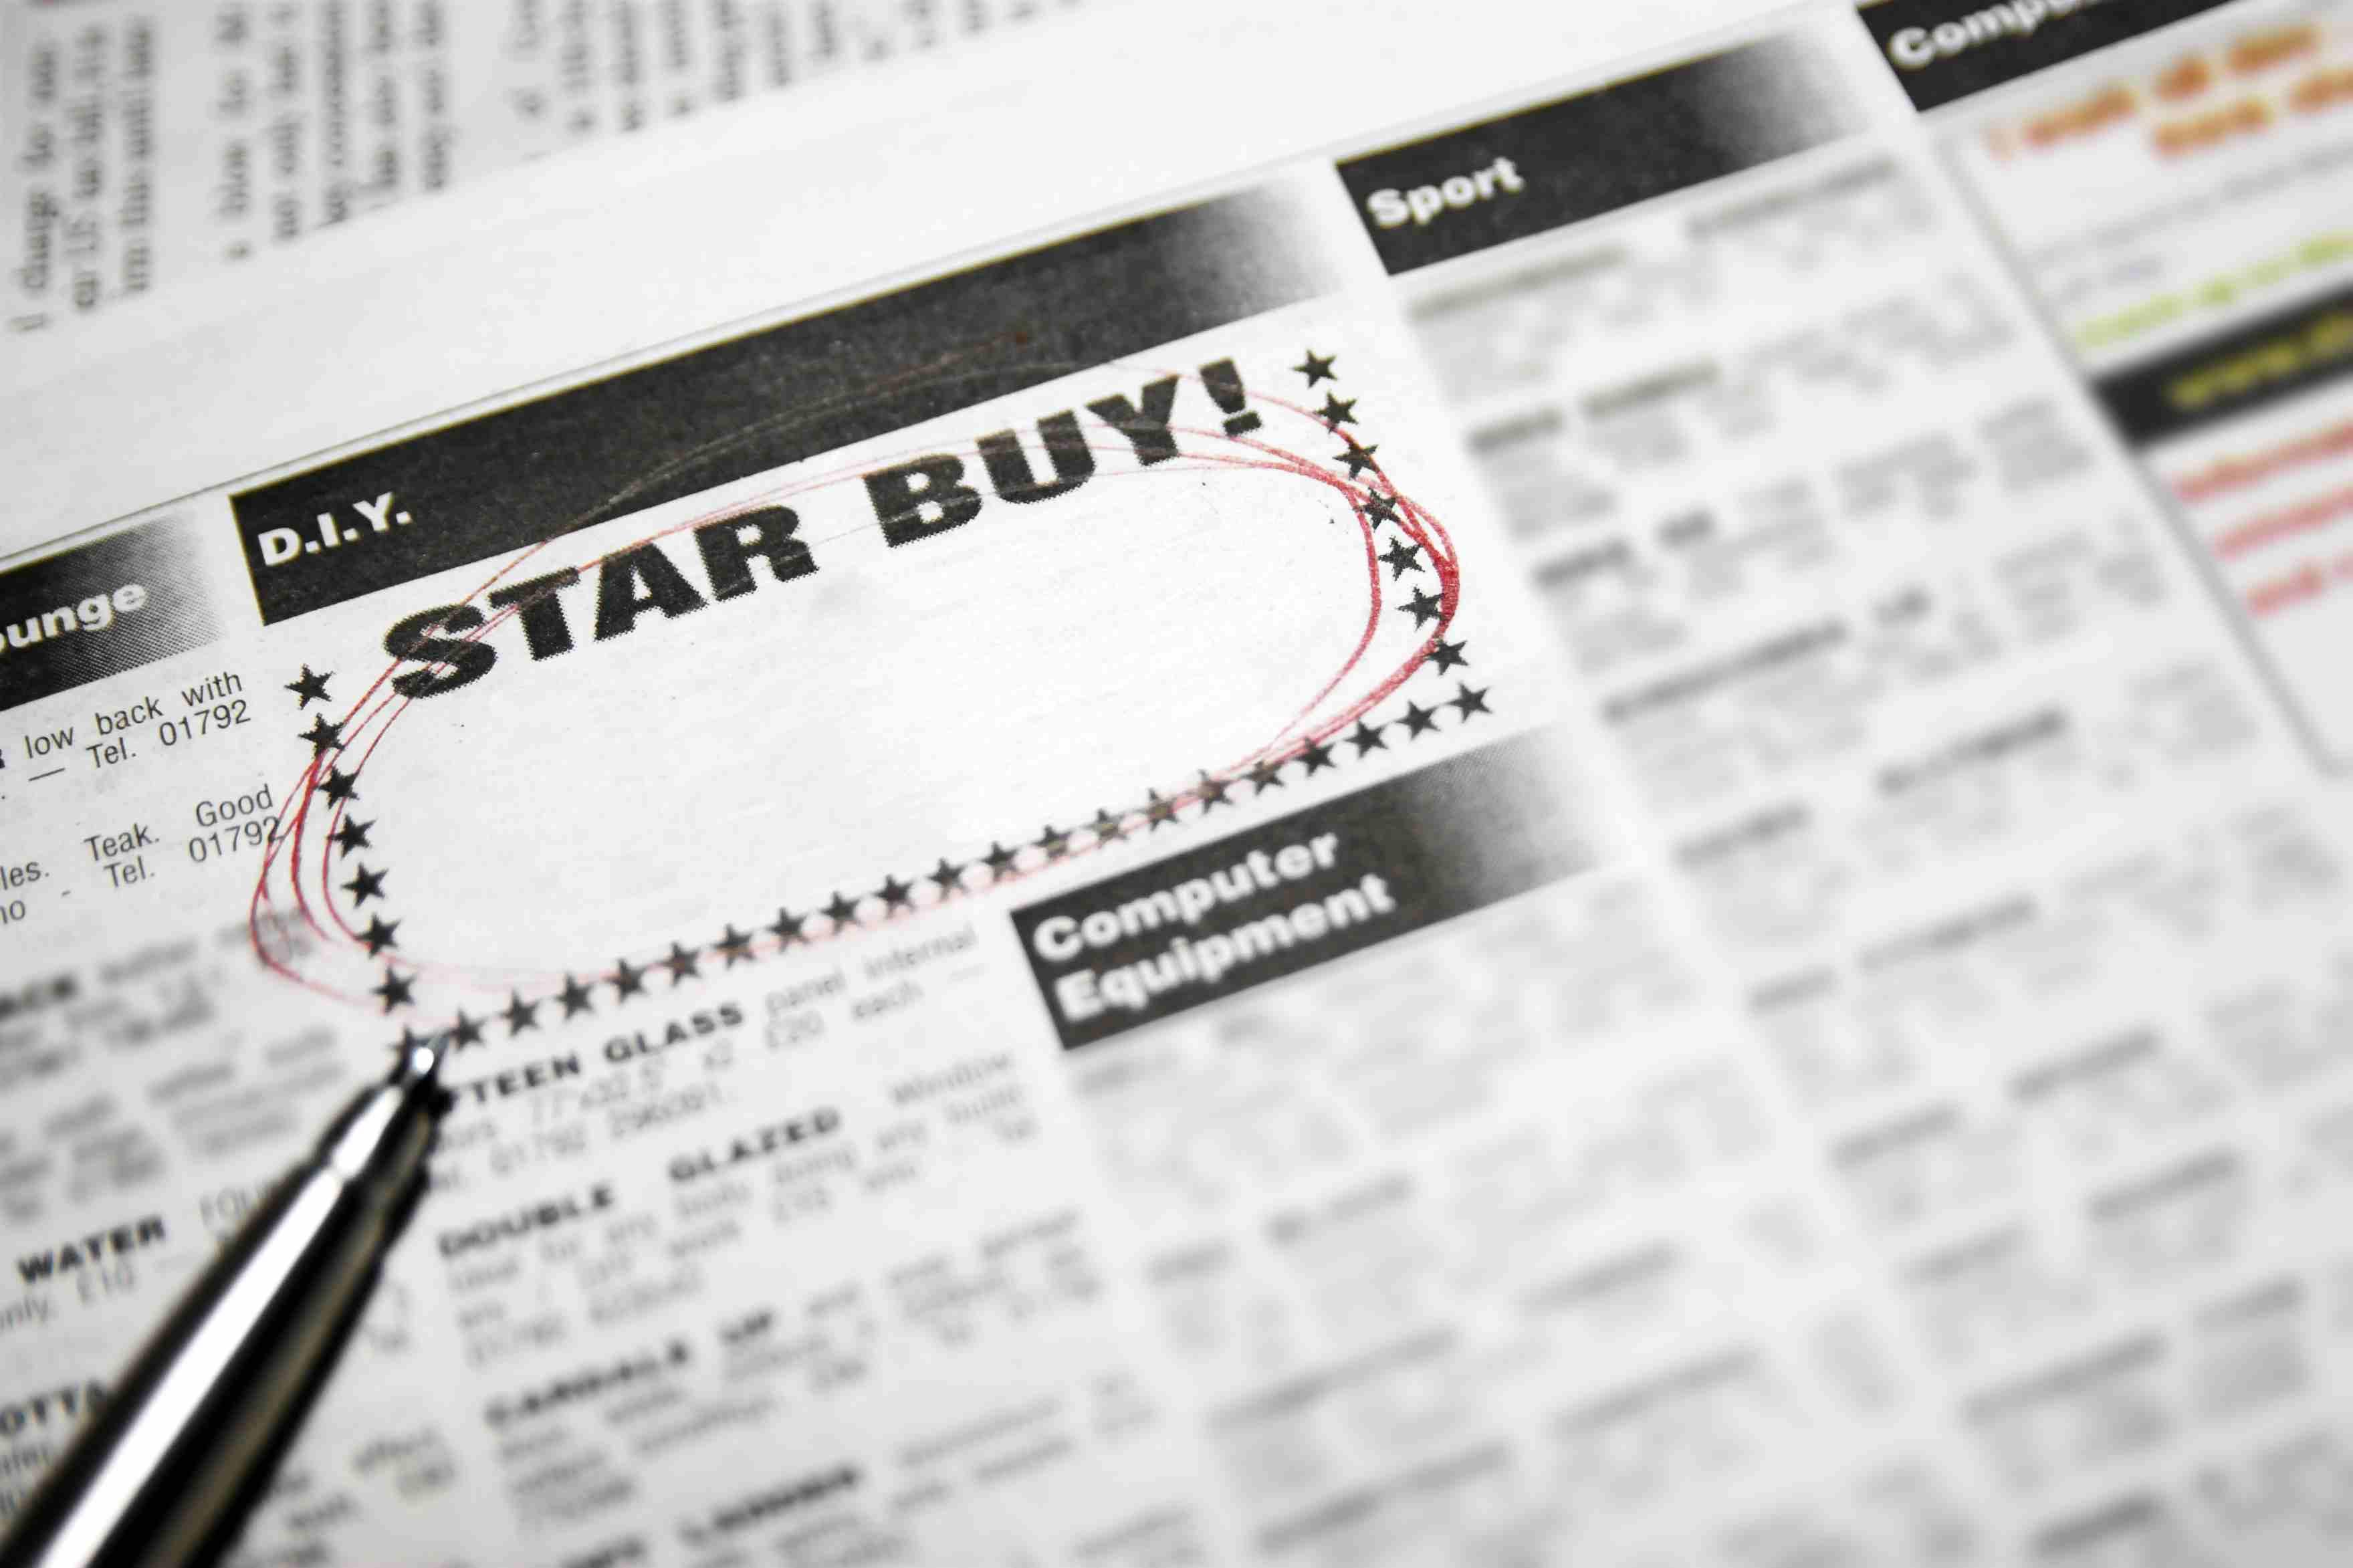 Star buy advert